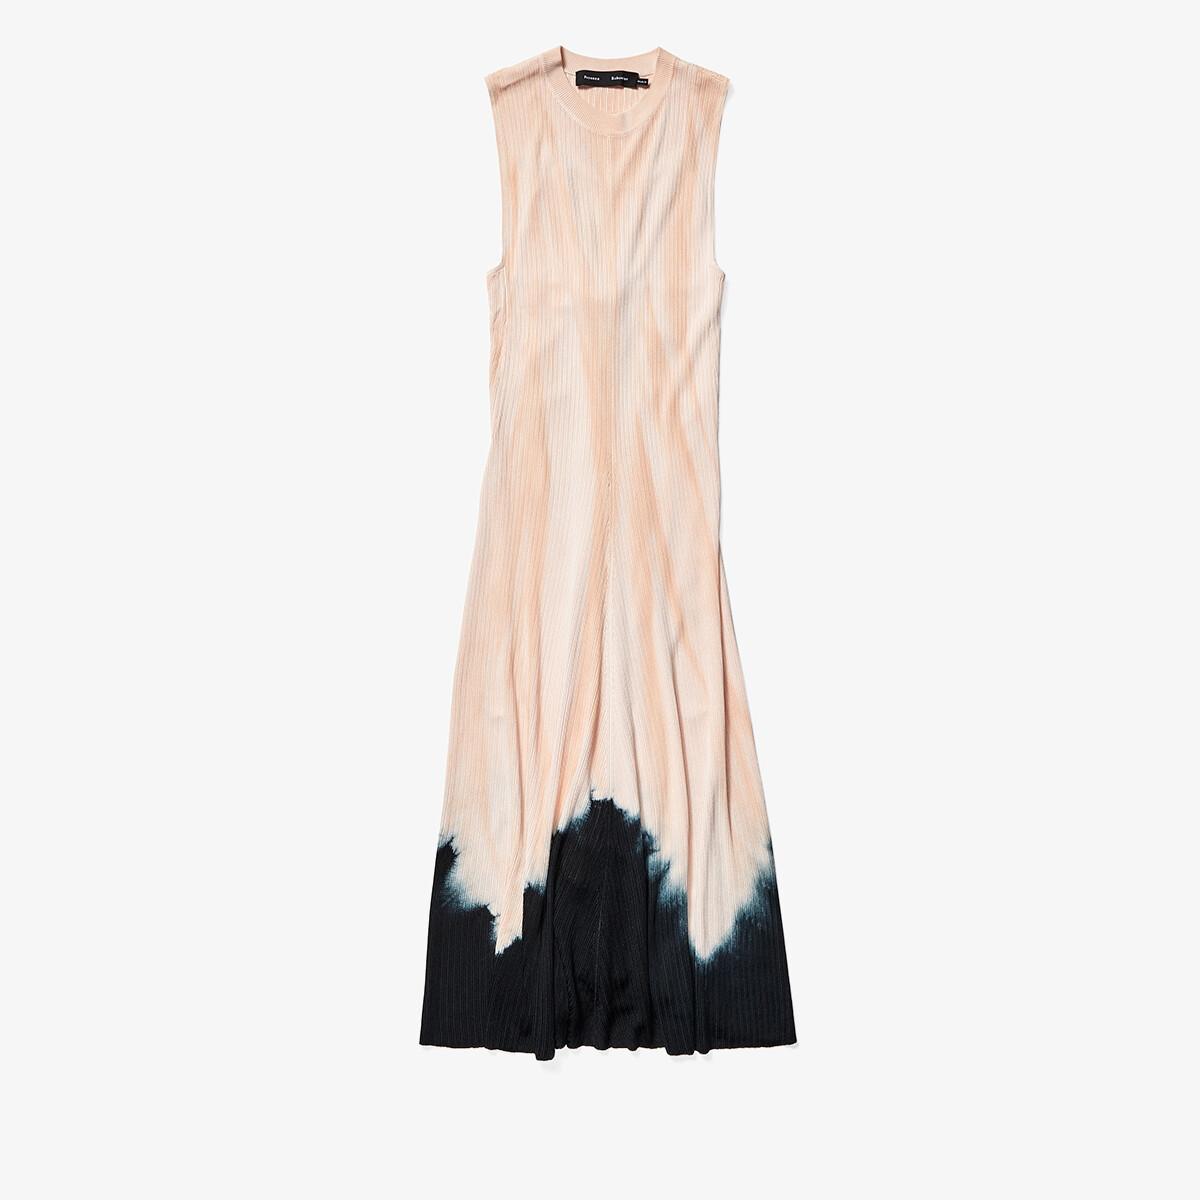 Imbracaminte Femei Proenza Schouler Tie-Dye Sleeveless Knotted Back Dress Dark SalmonBlack